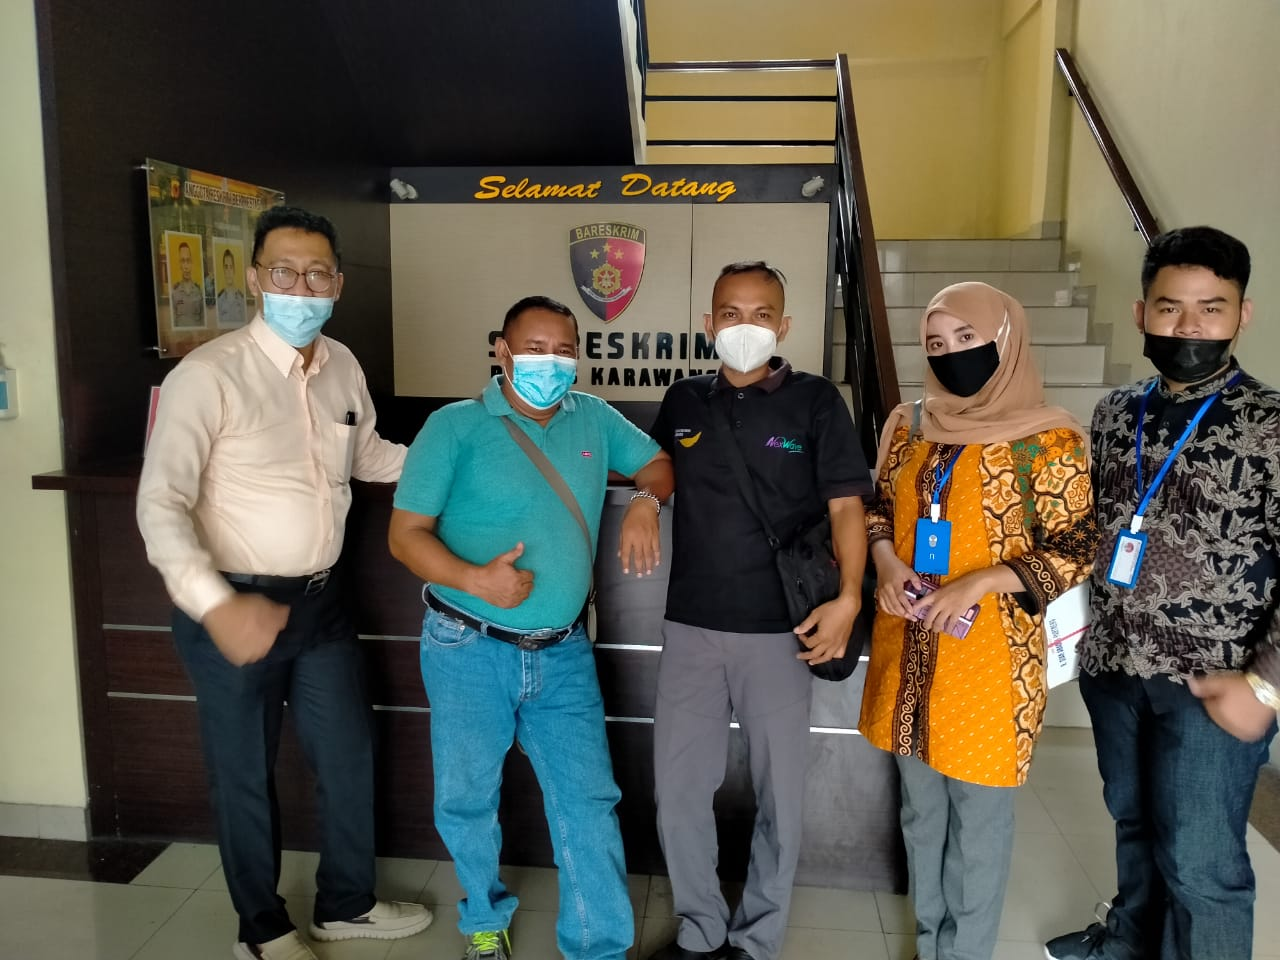 Pedagang Maranggi Laporkan 3 Orang ke Polres Karawang. Gara-gara Tempat Usahanya Dihancurkan